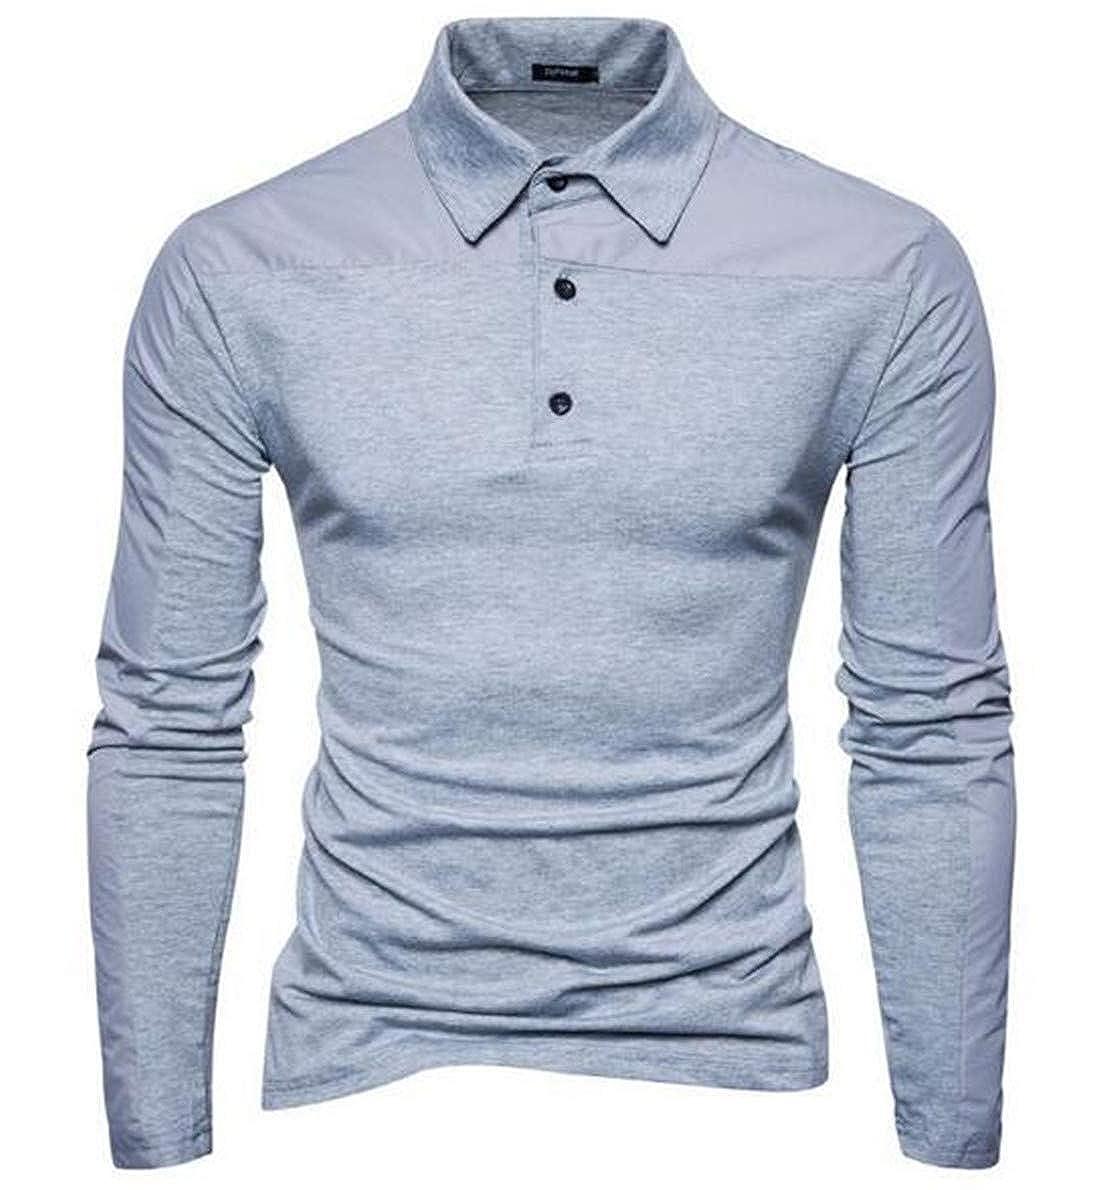 KLJR Men Long Sleeve Classic Business Slim Fit Cotton Polo T Shirts